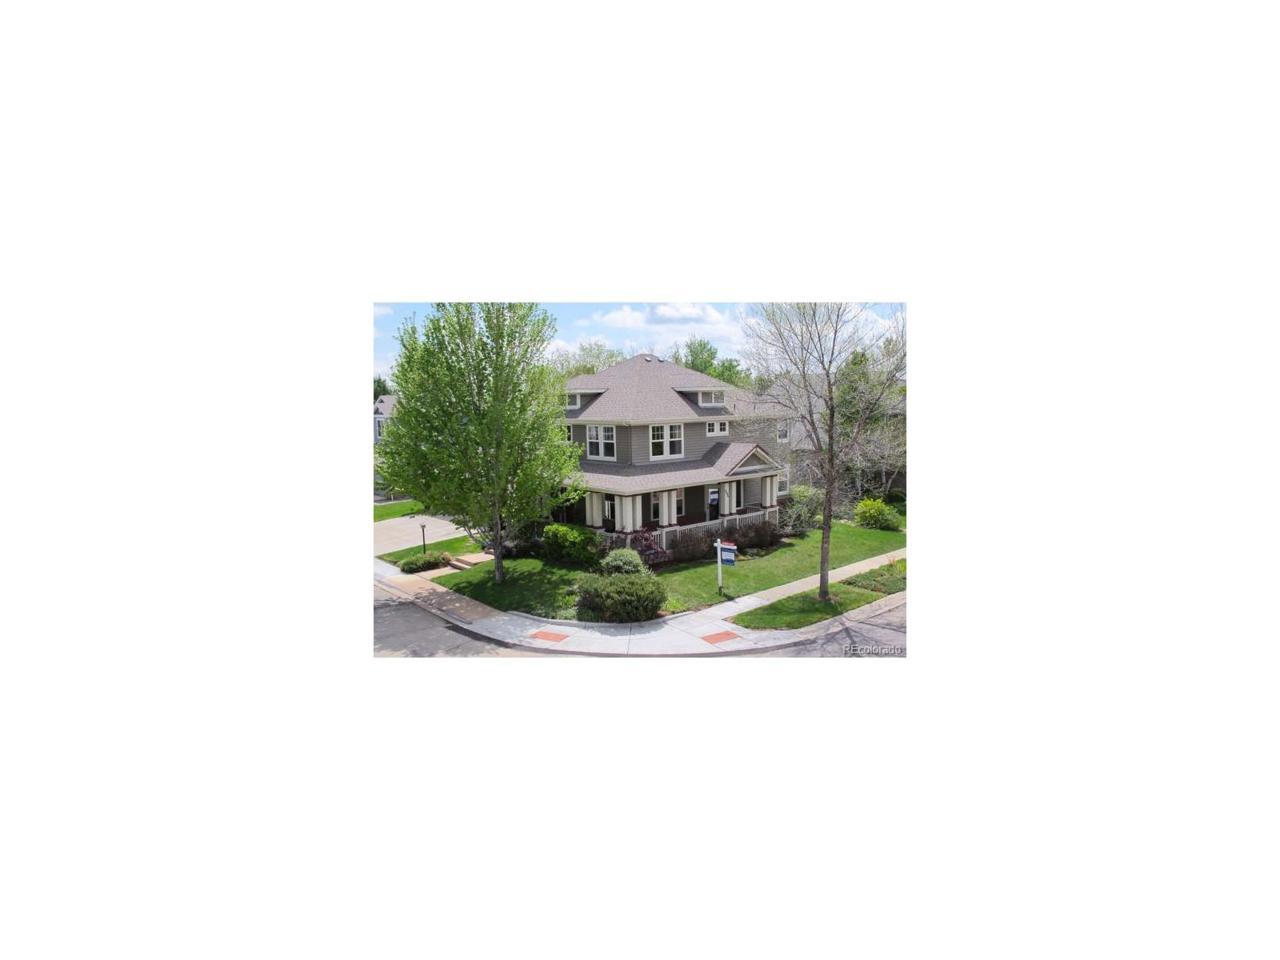 4176 Saint Croix Street, Boulder, CO 80301 (MLS #1586385) :: 8z Real Estate